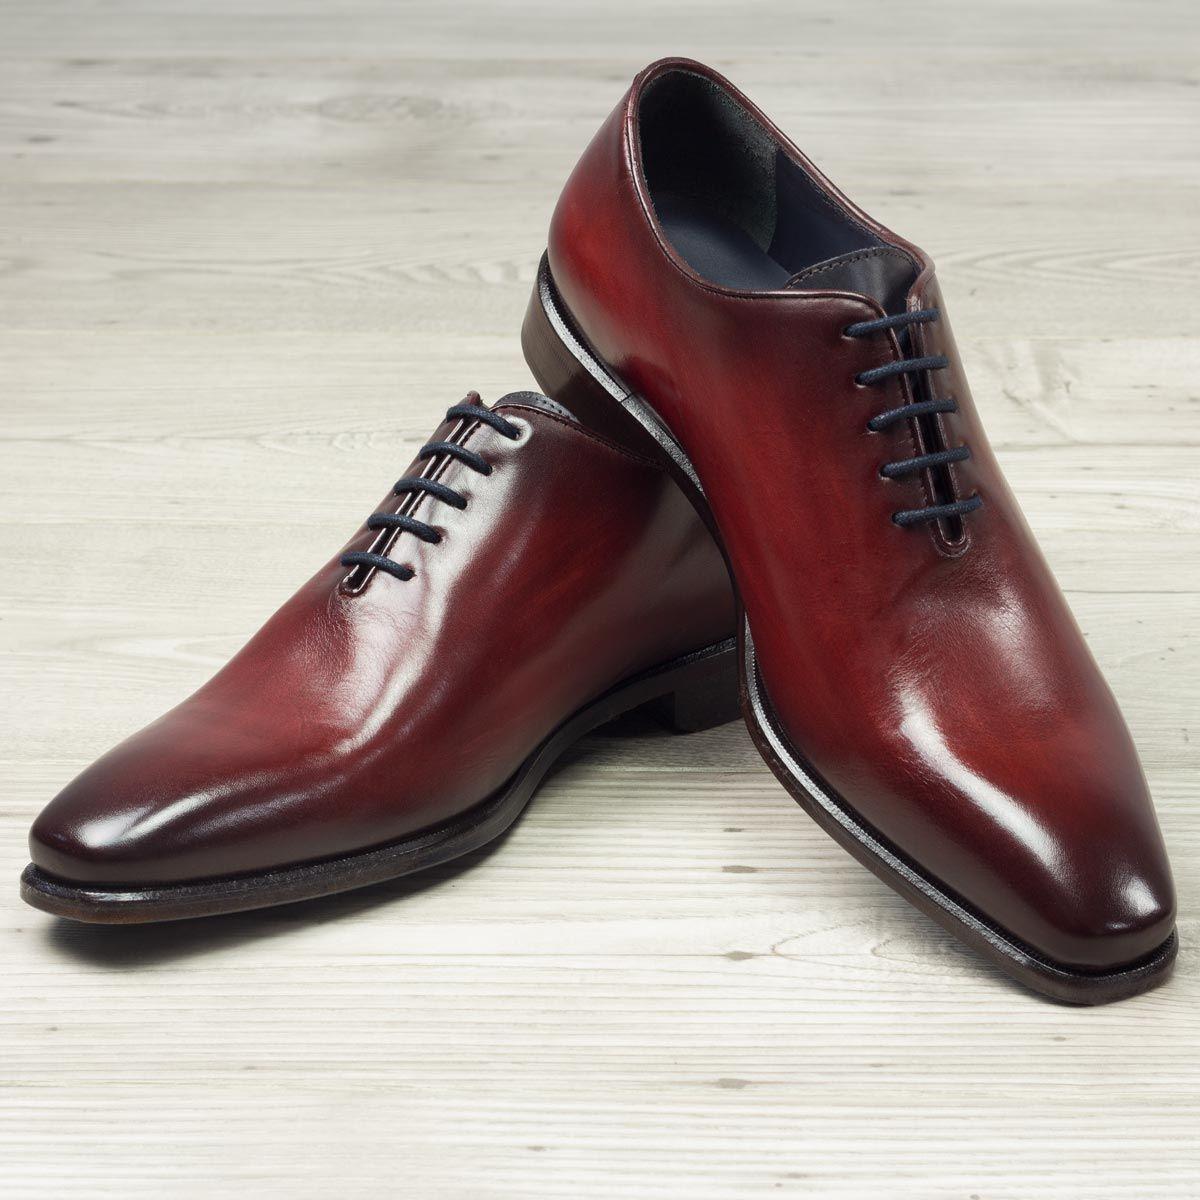 wholecut london nigeria southafrica shoes premium wedding shoe